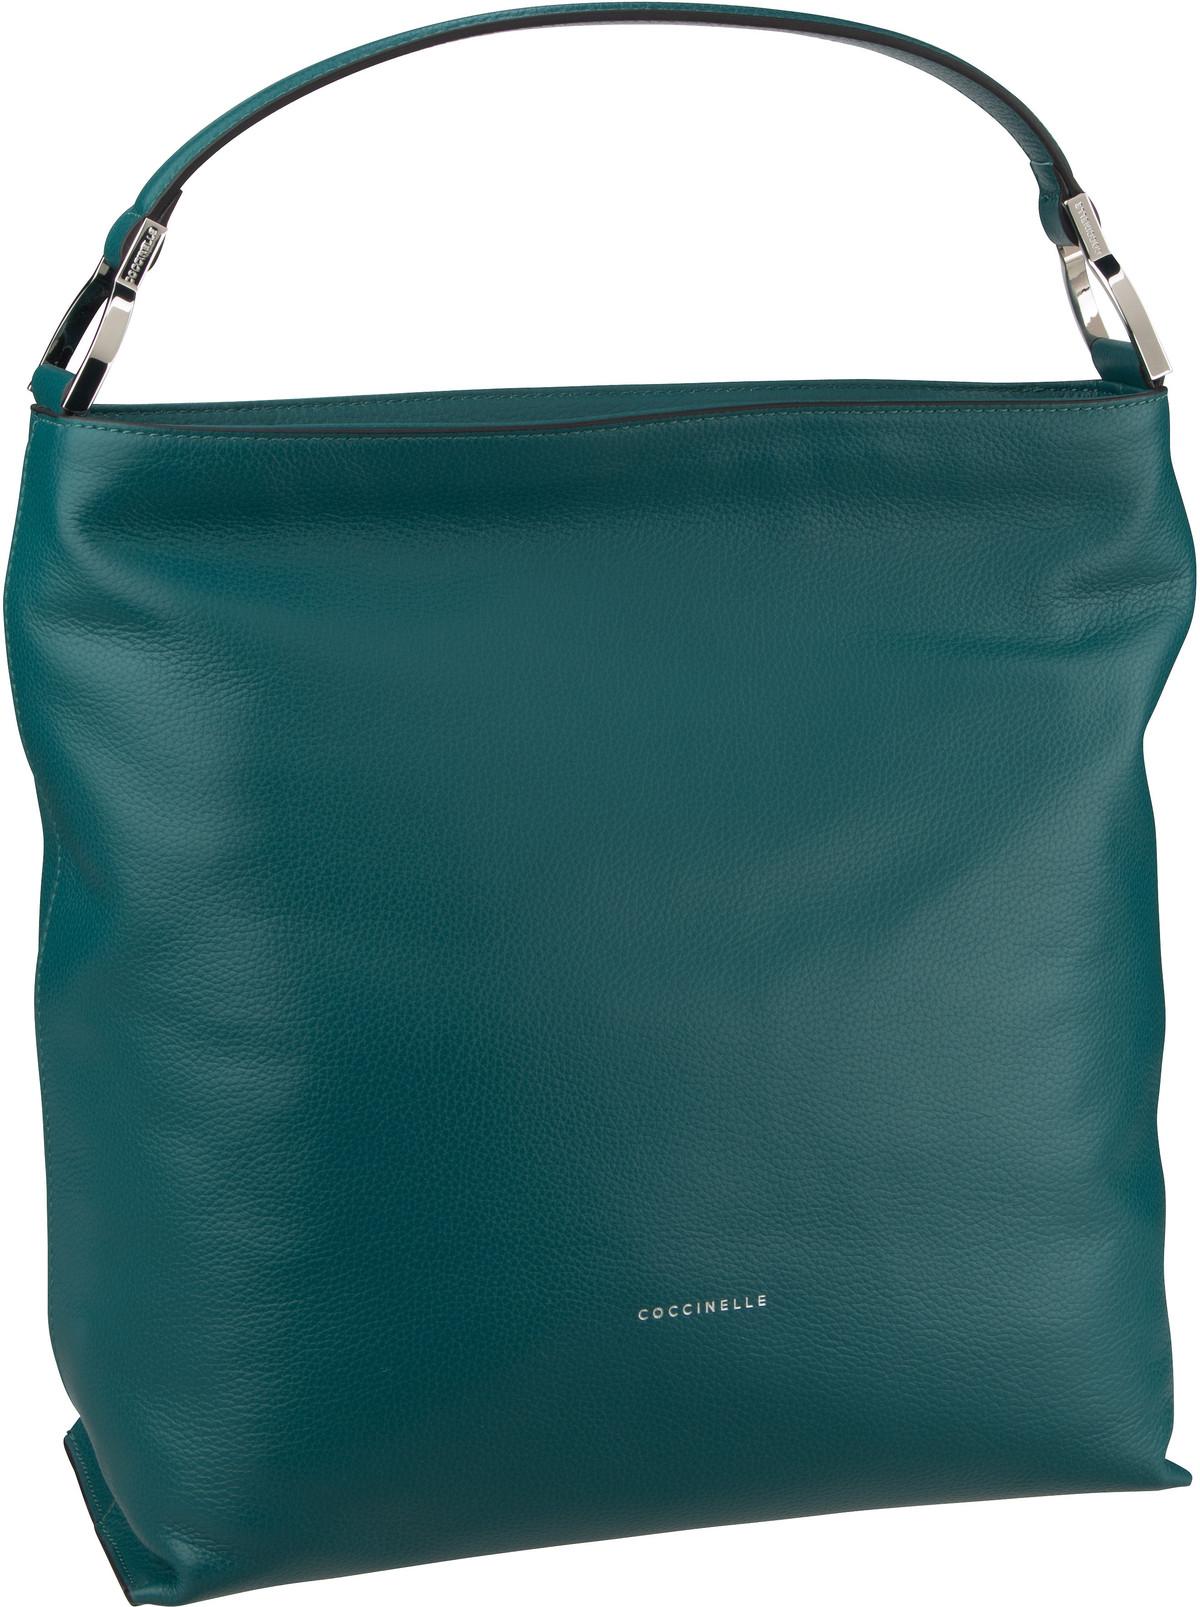 Handtasche Keyla 1302 Teal